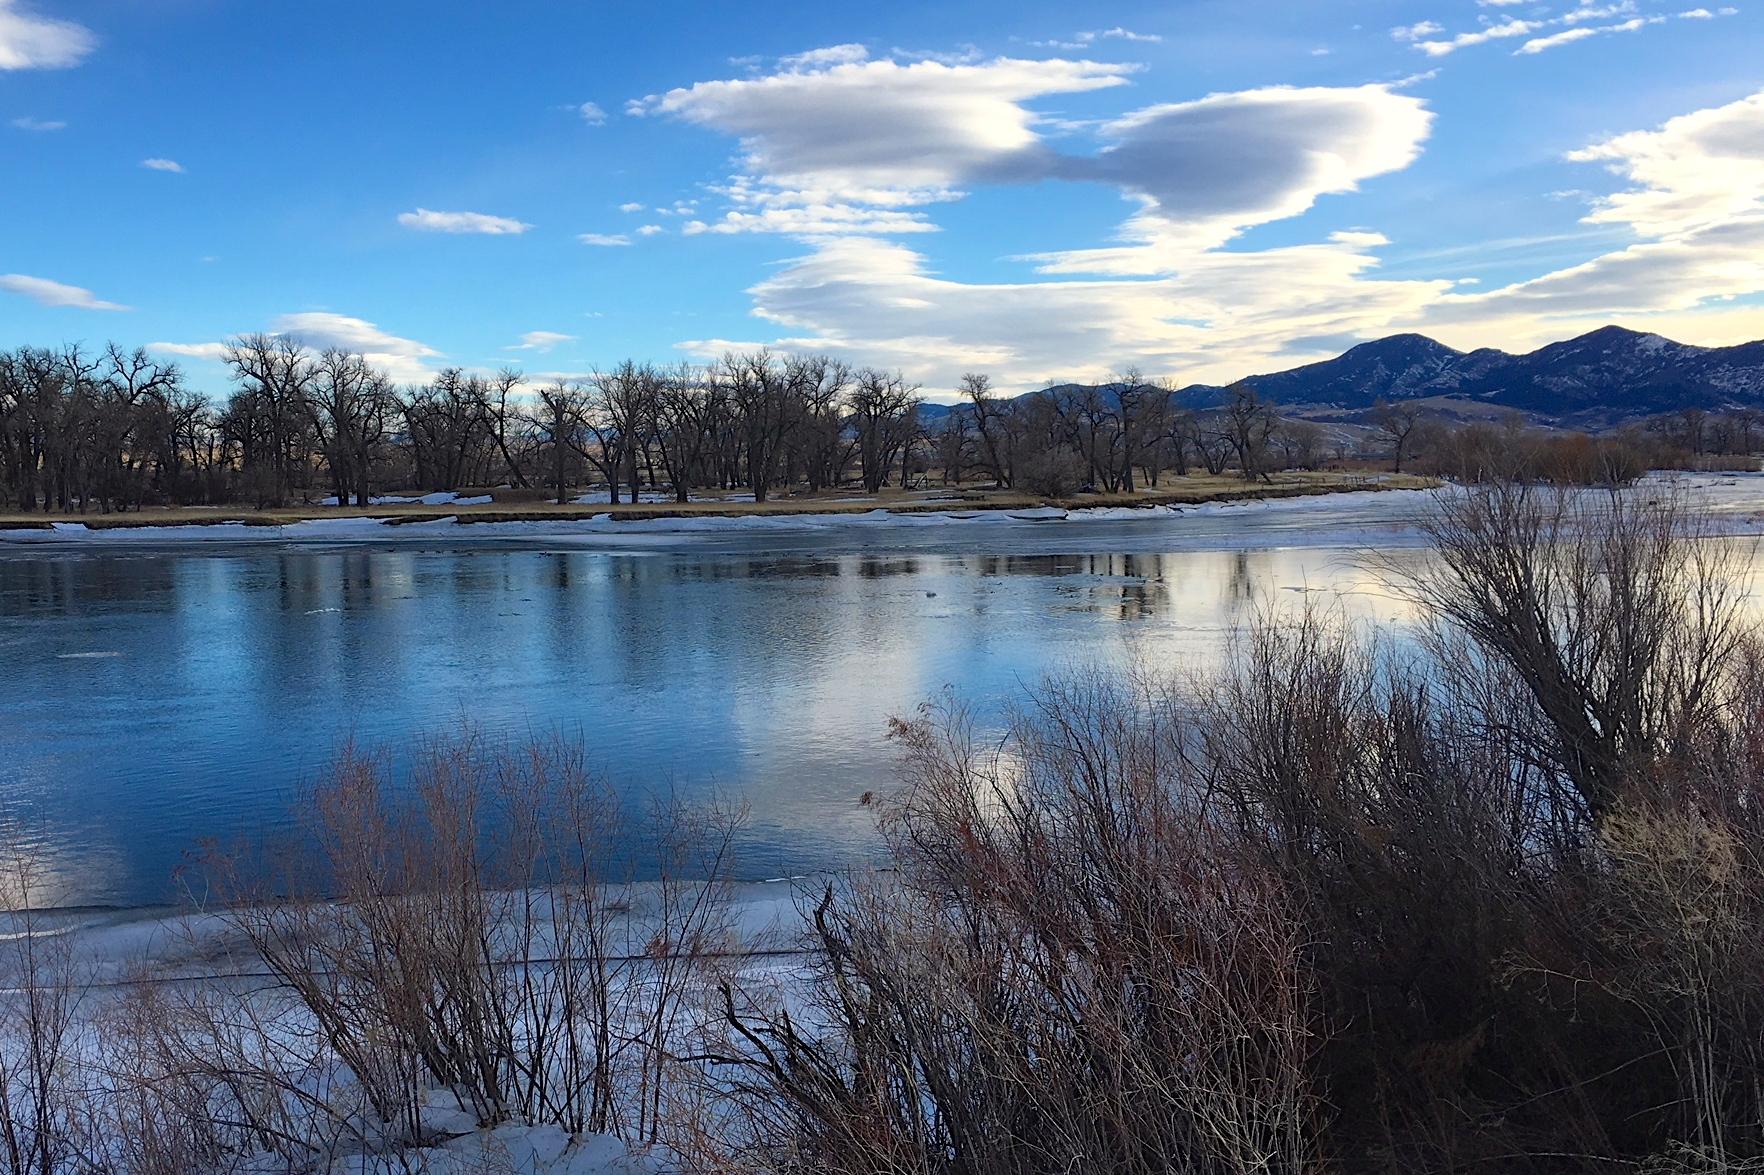 Tuesday January 9th Missouri River Fishing Report